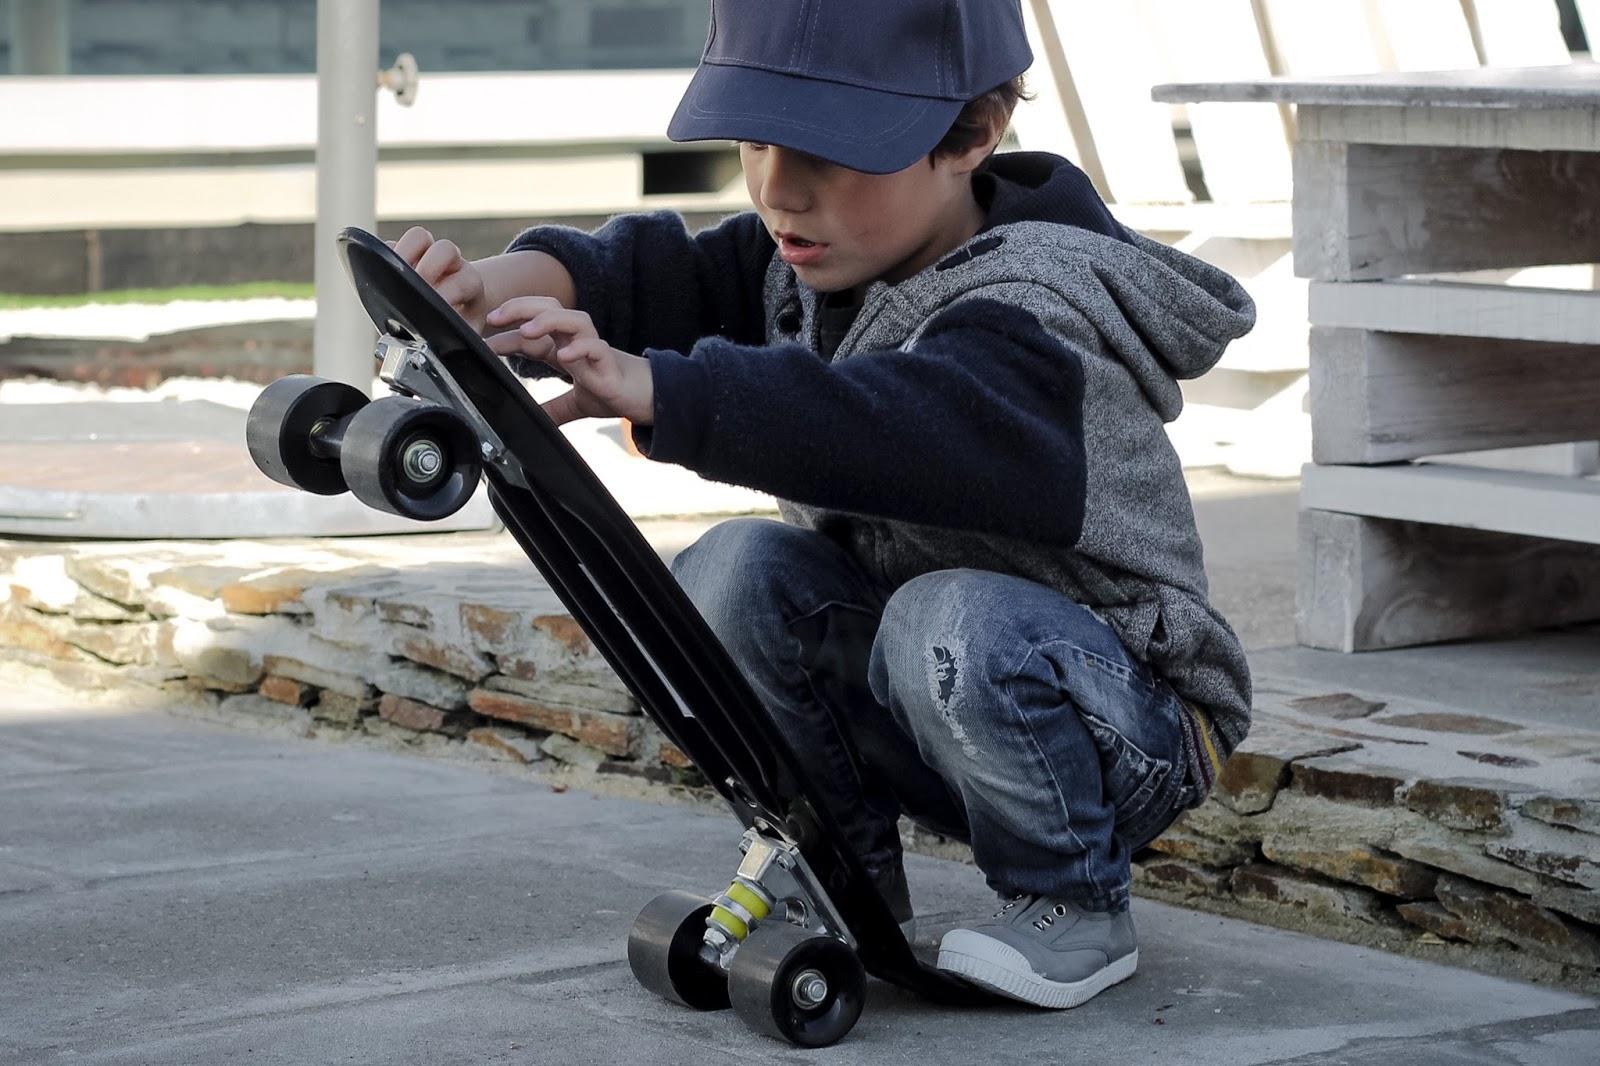 cool kids skate